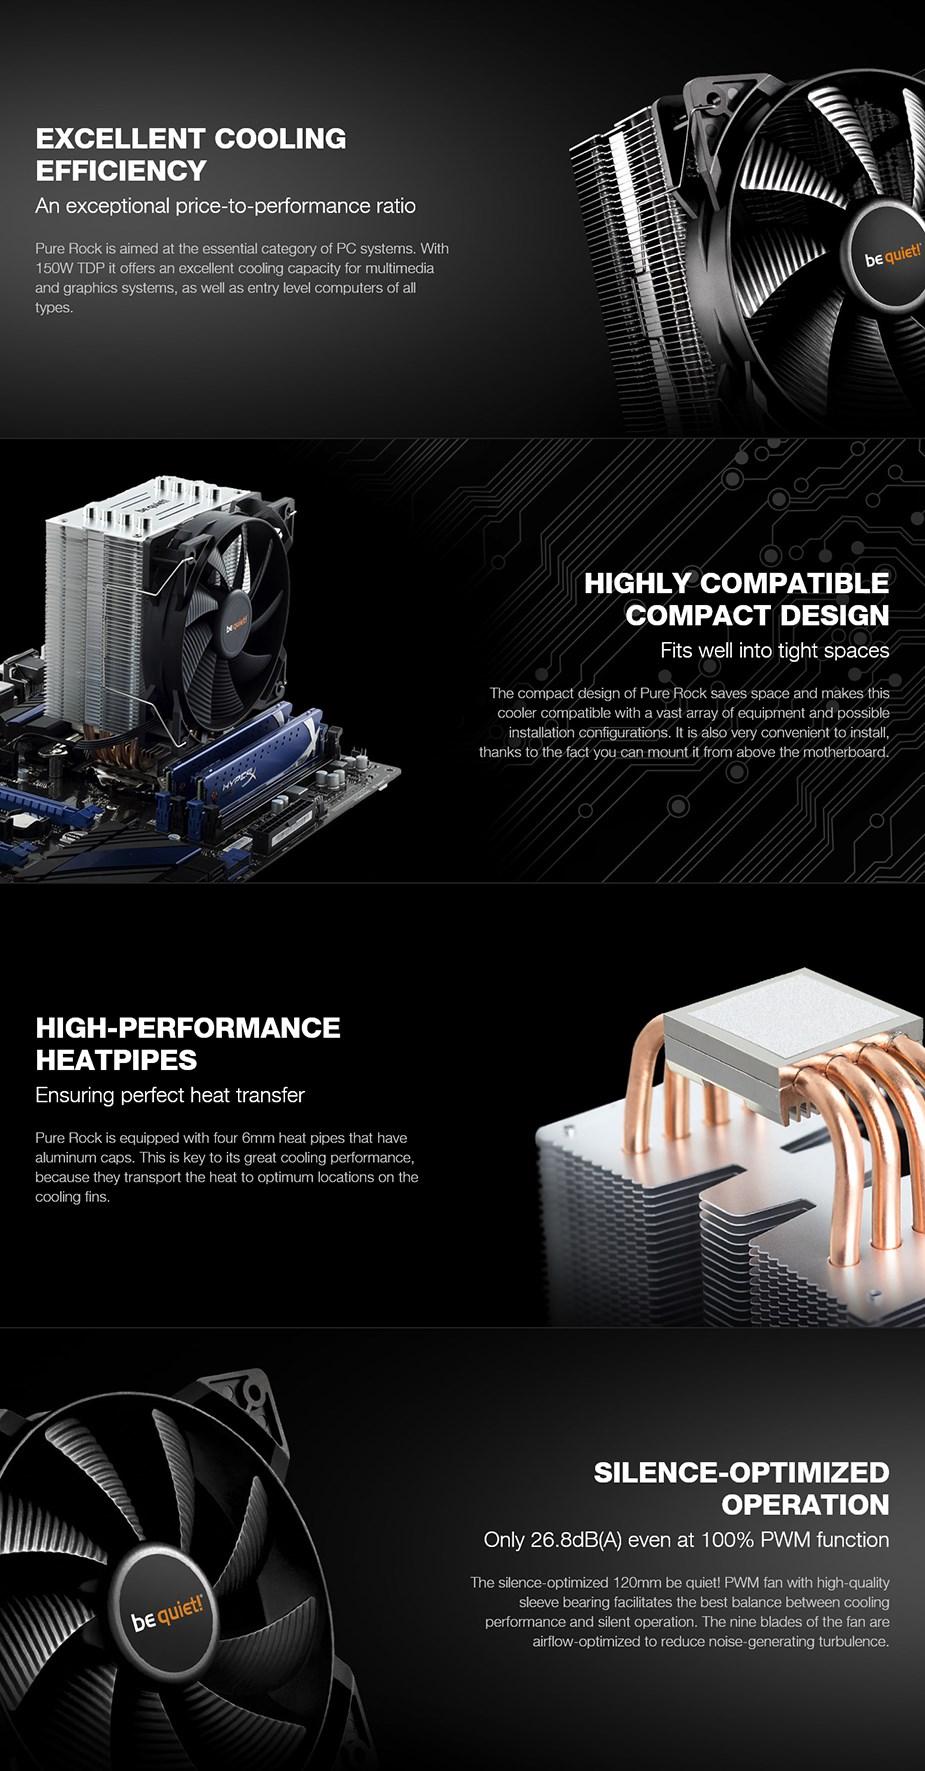 be quiet! Pure Rock CPU Air Cooler - Desktop Overview 1